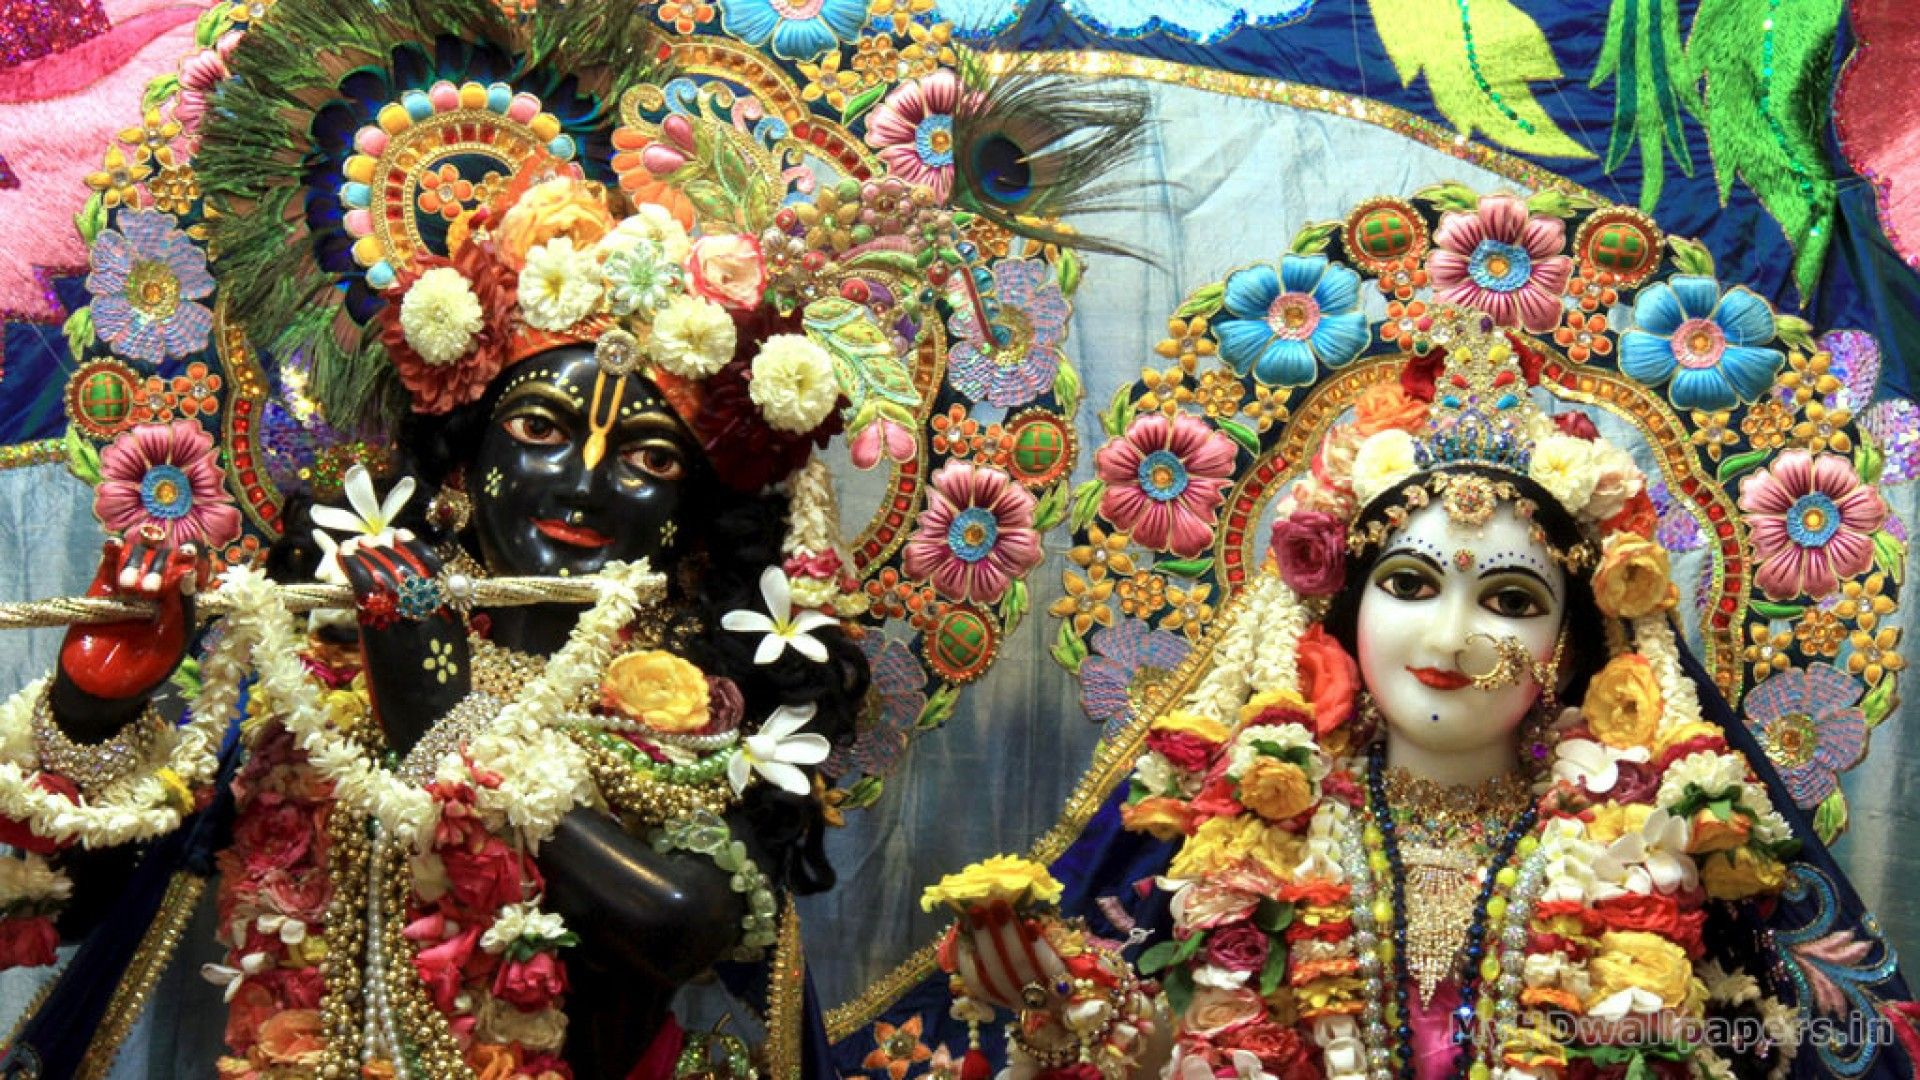 Click Here To Download In Hd Format Iskcon Radha Krishna Http Www Superw Krishna Wallpaper Radha Krishna Wallpaper Lord Krishna Wallpapers